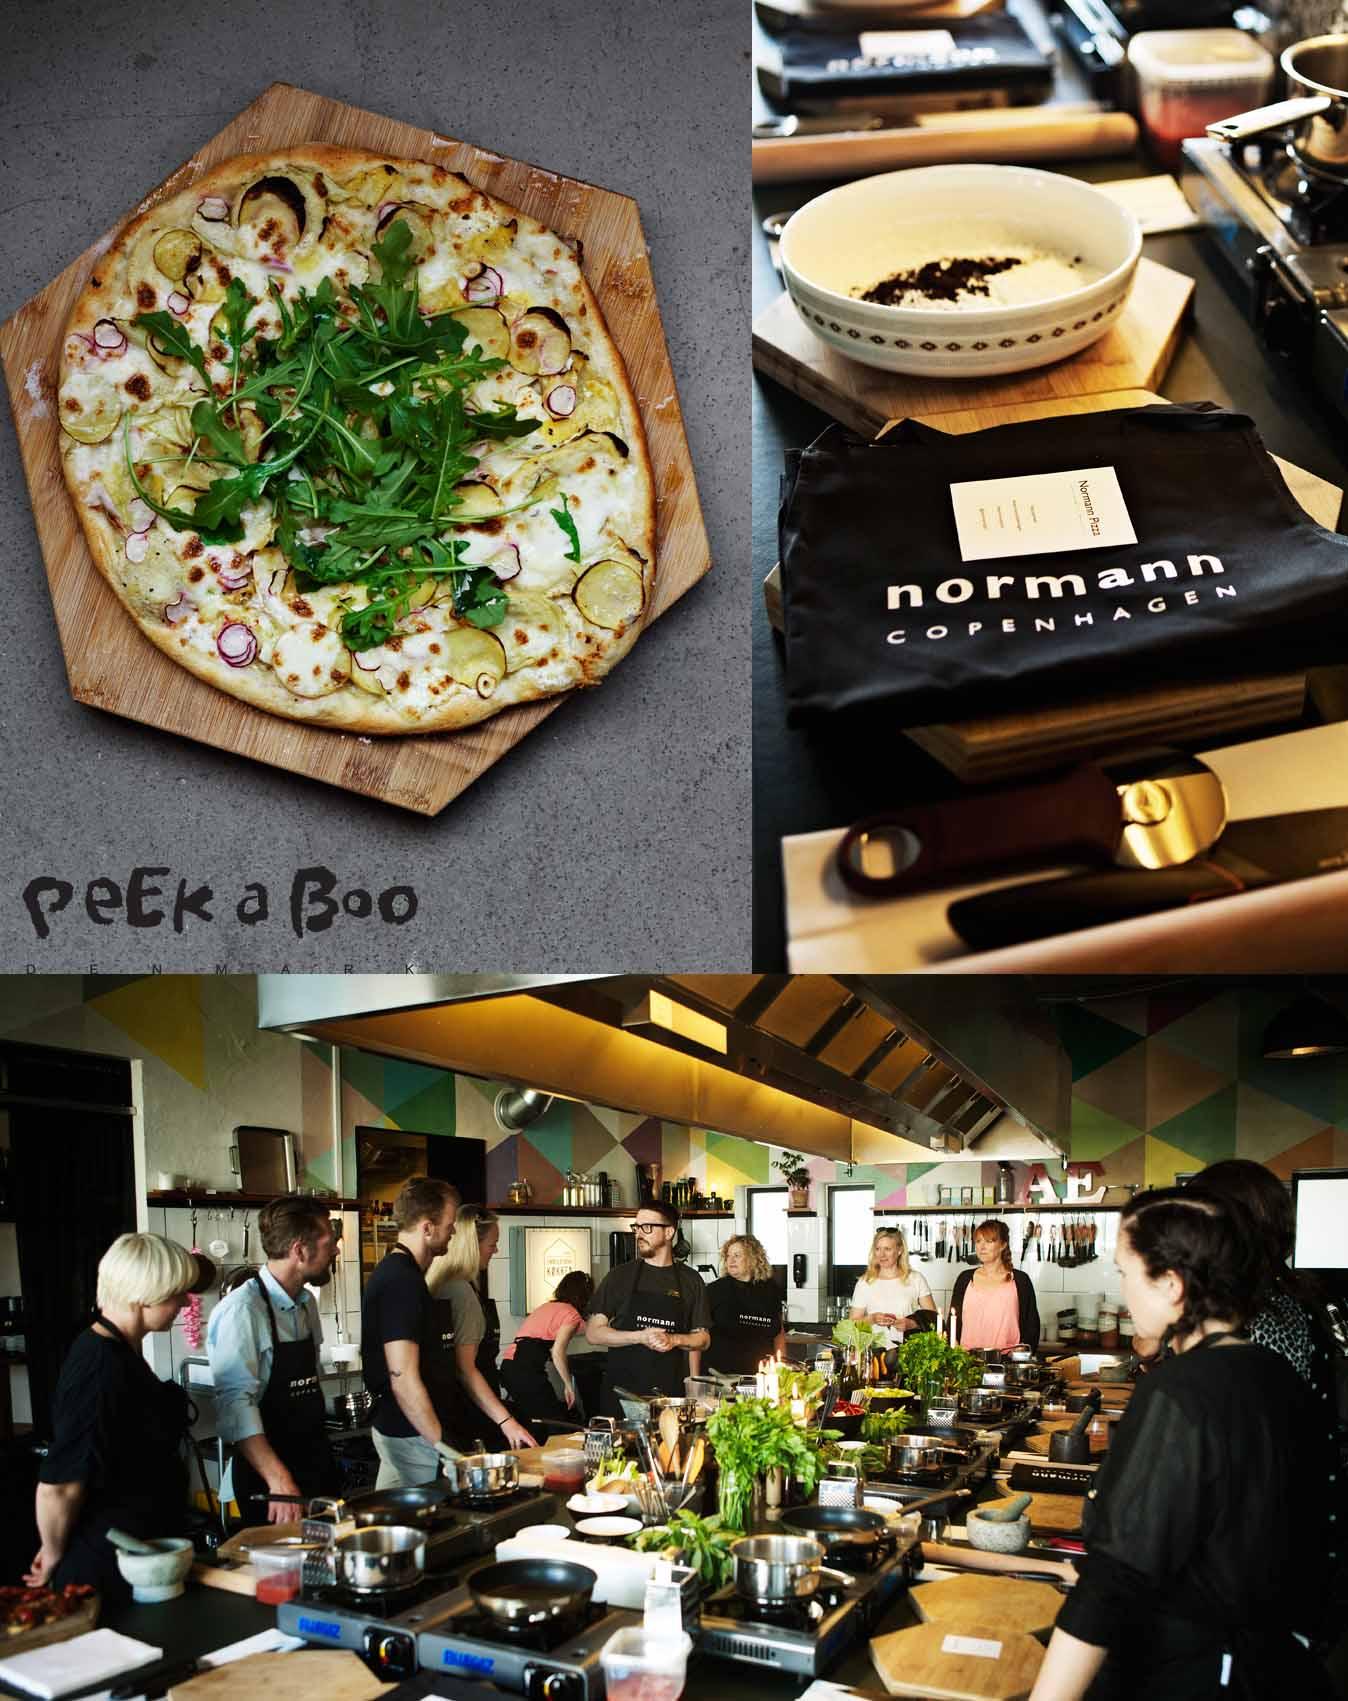 Pizza, Tim Vladimir's køkken, valby, Normann Cph., Normann, Pizzawheel,